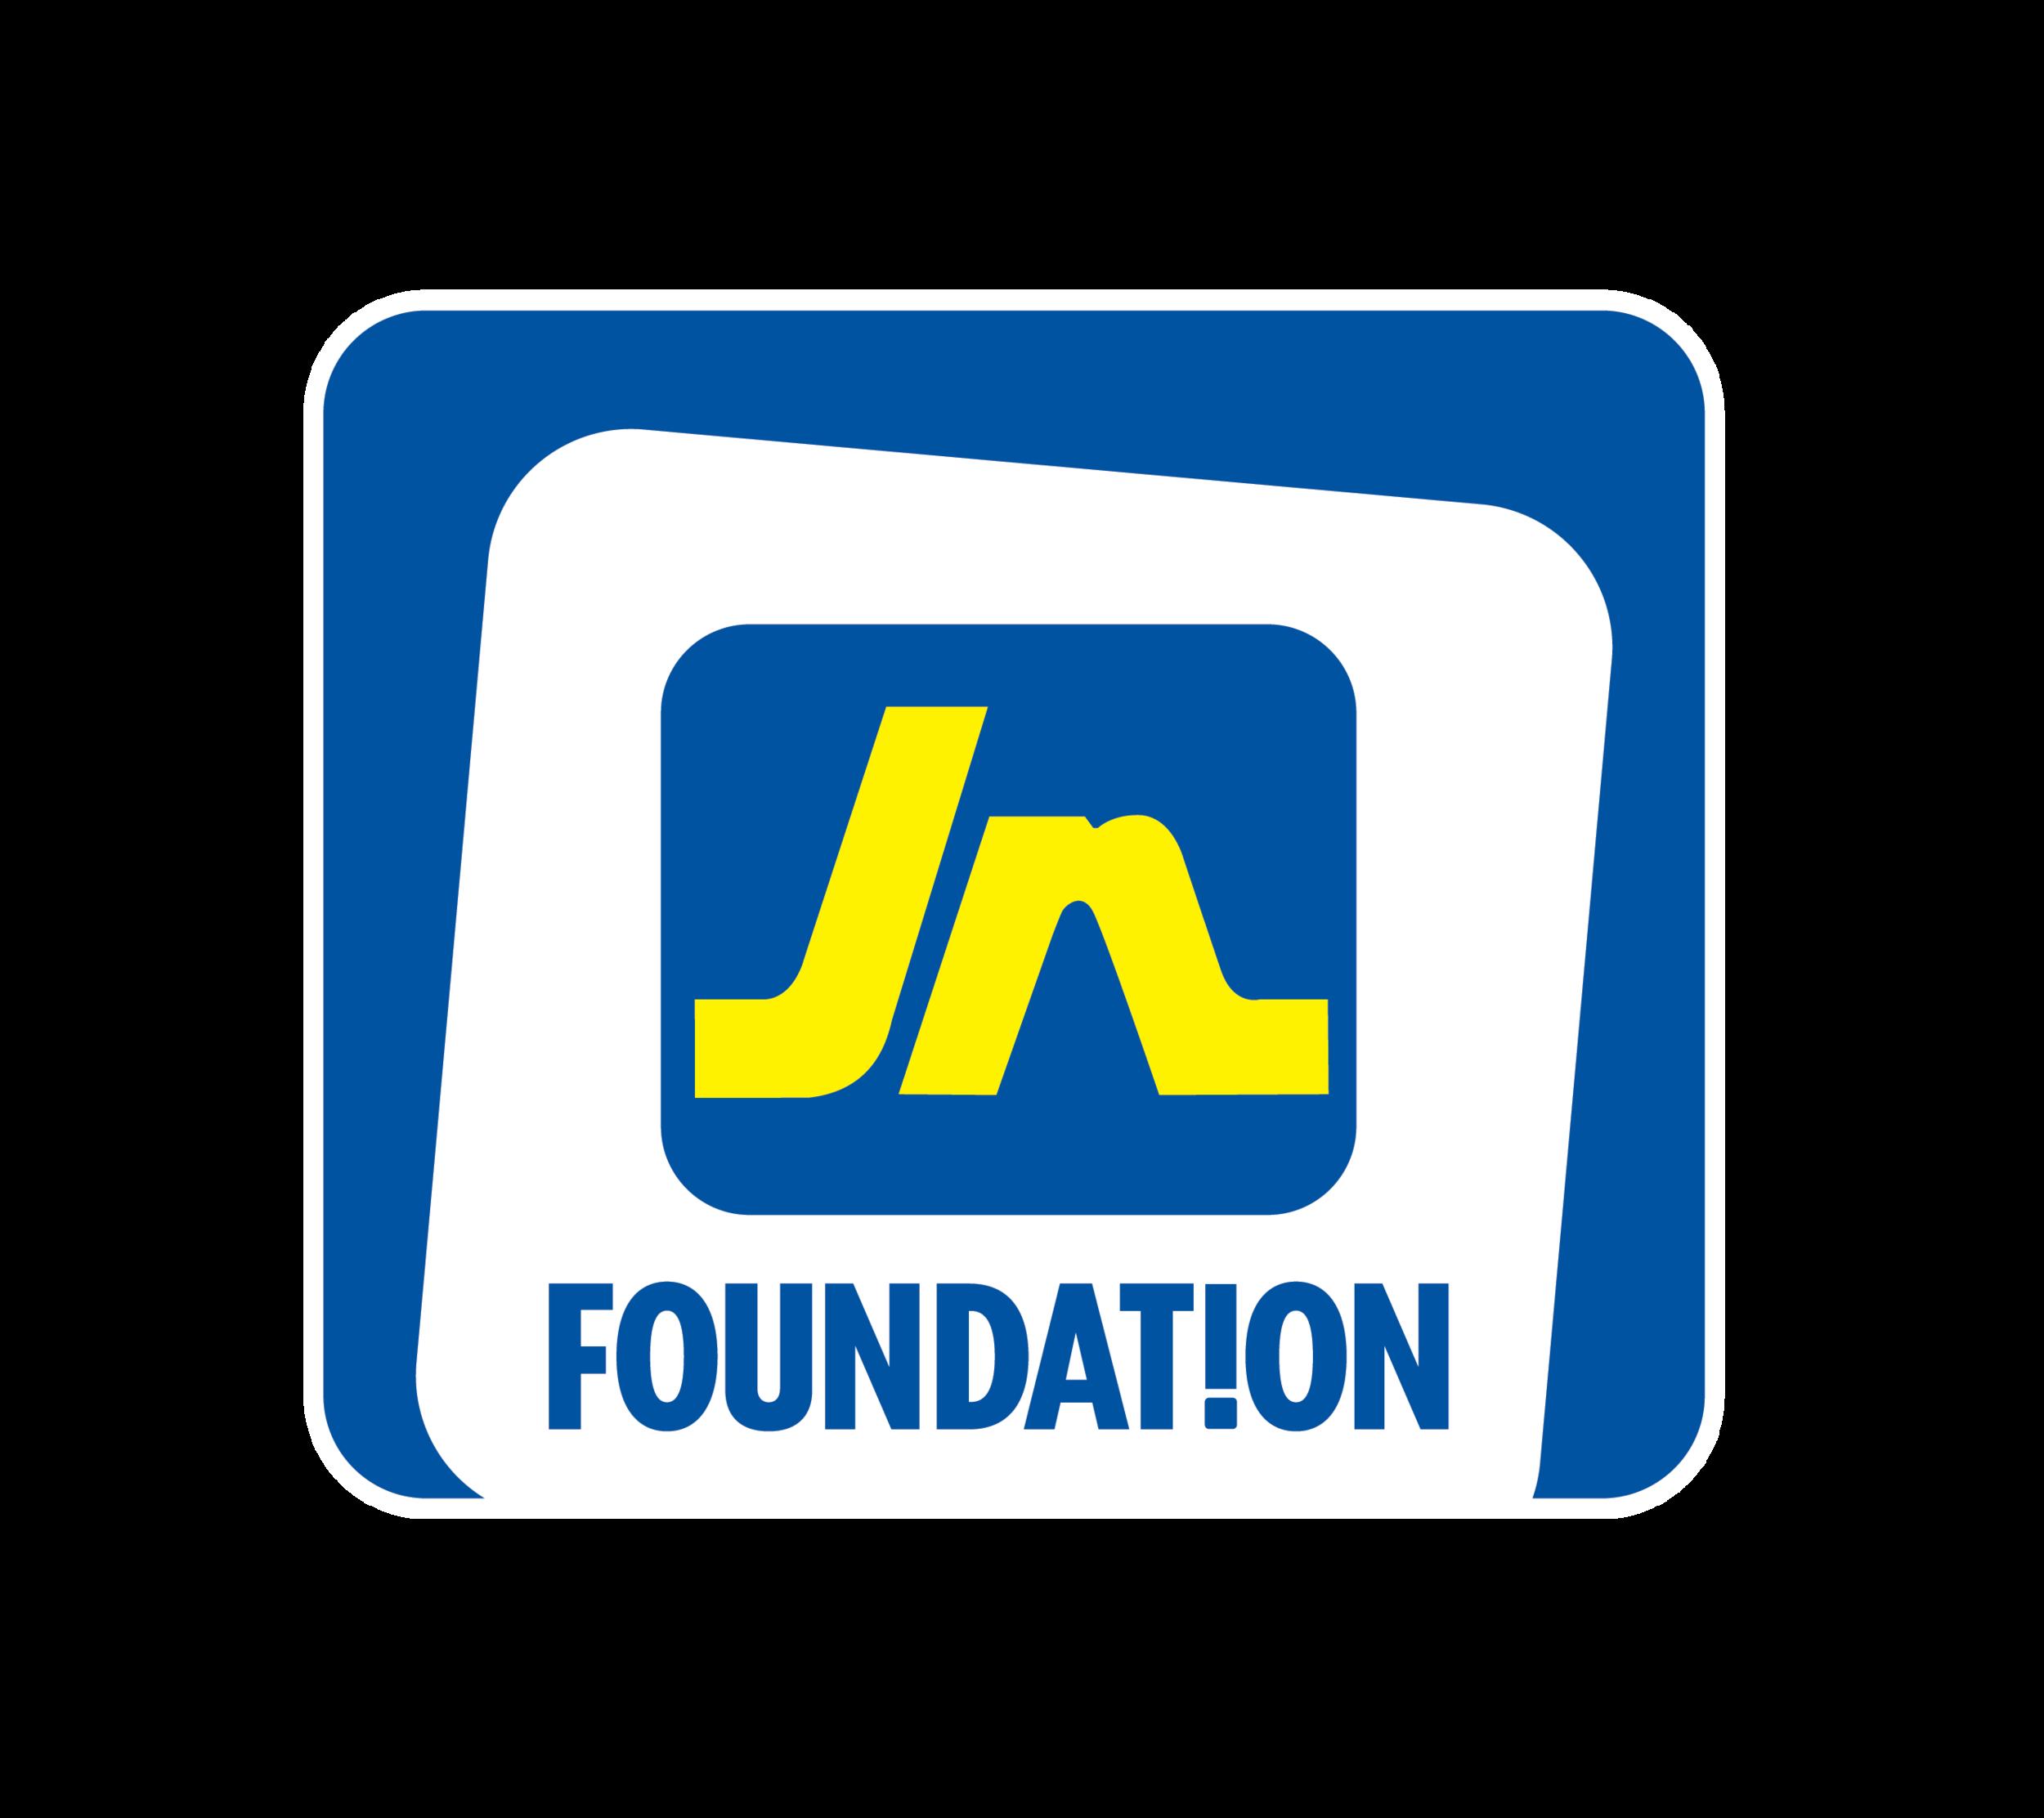 - JN FOUNDATION